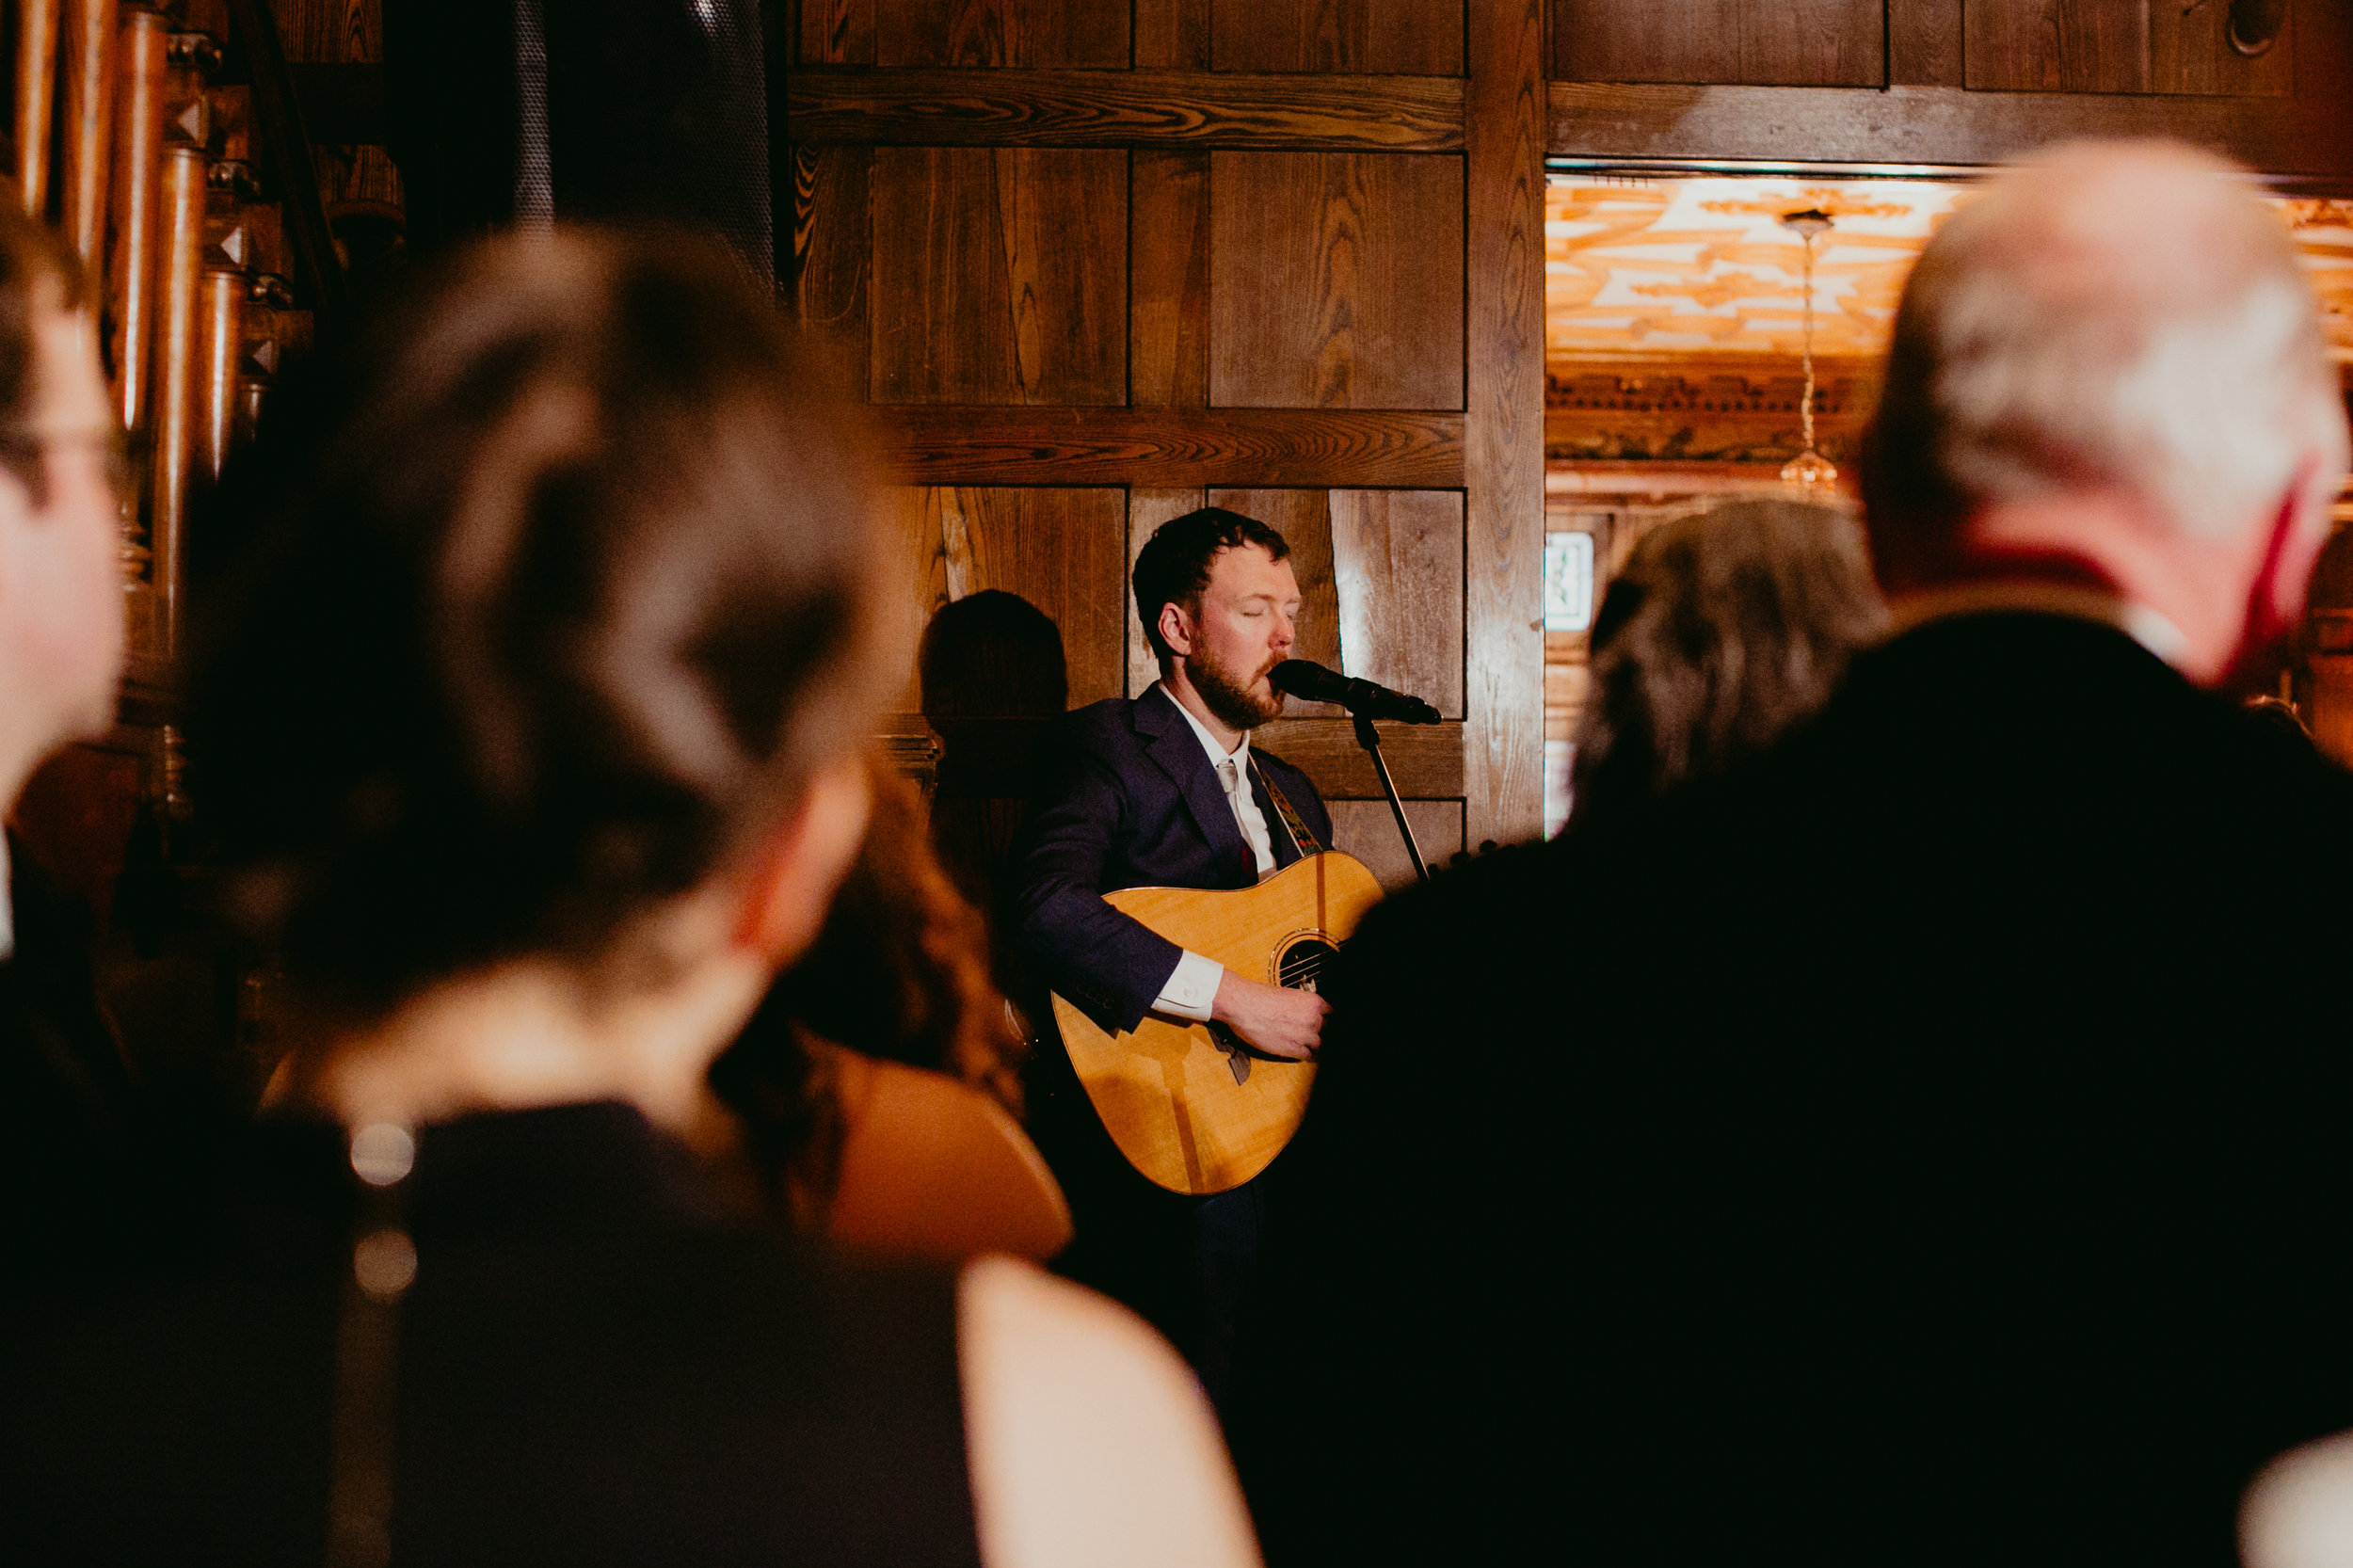 Tiger_House_The_Inn_at_Hudson-Wedding_Chellise_Michael_Photography-215.jpg